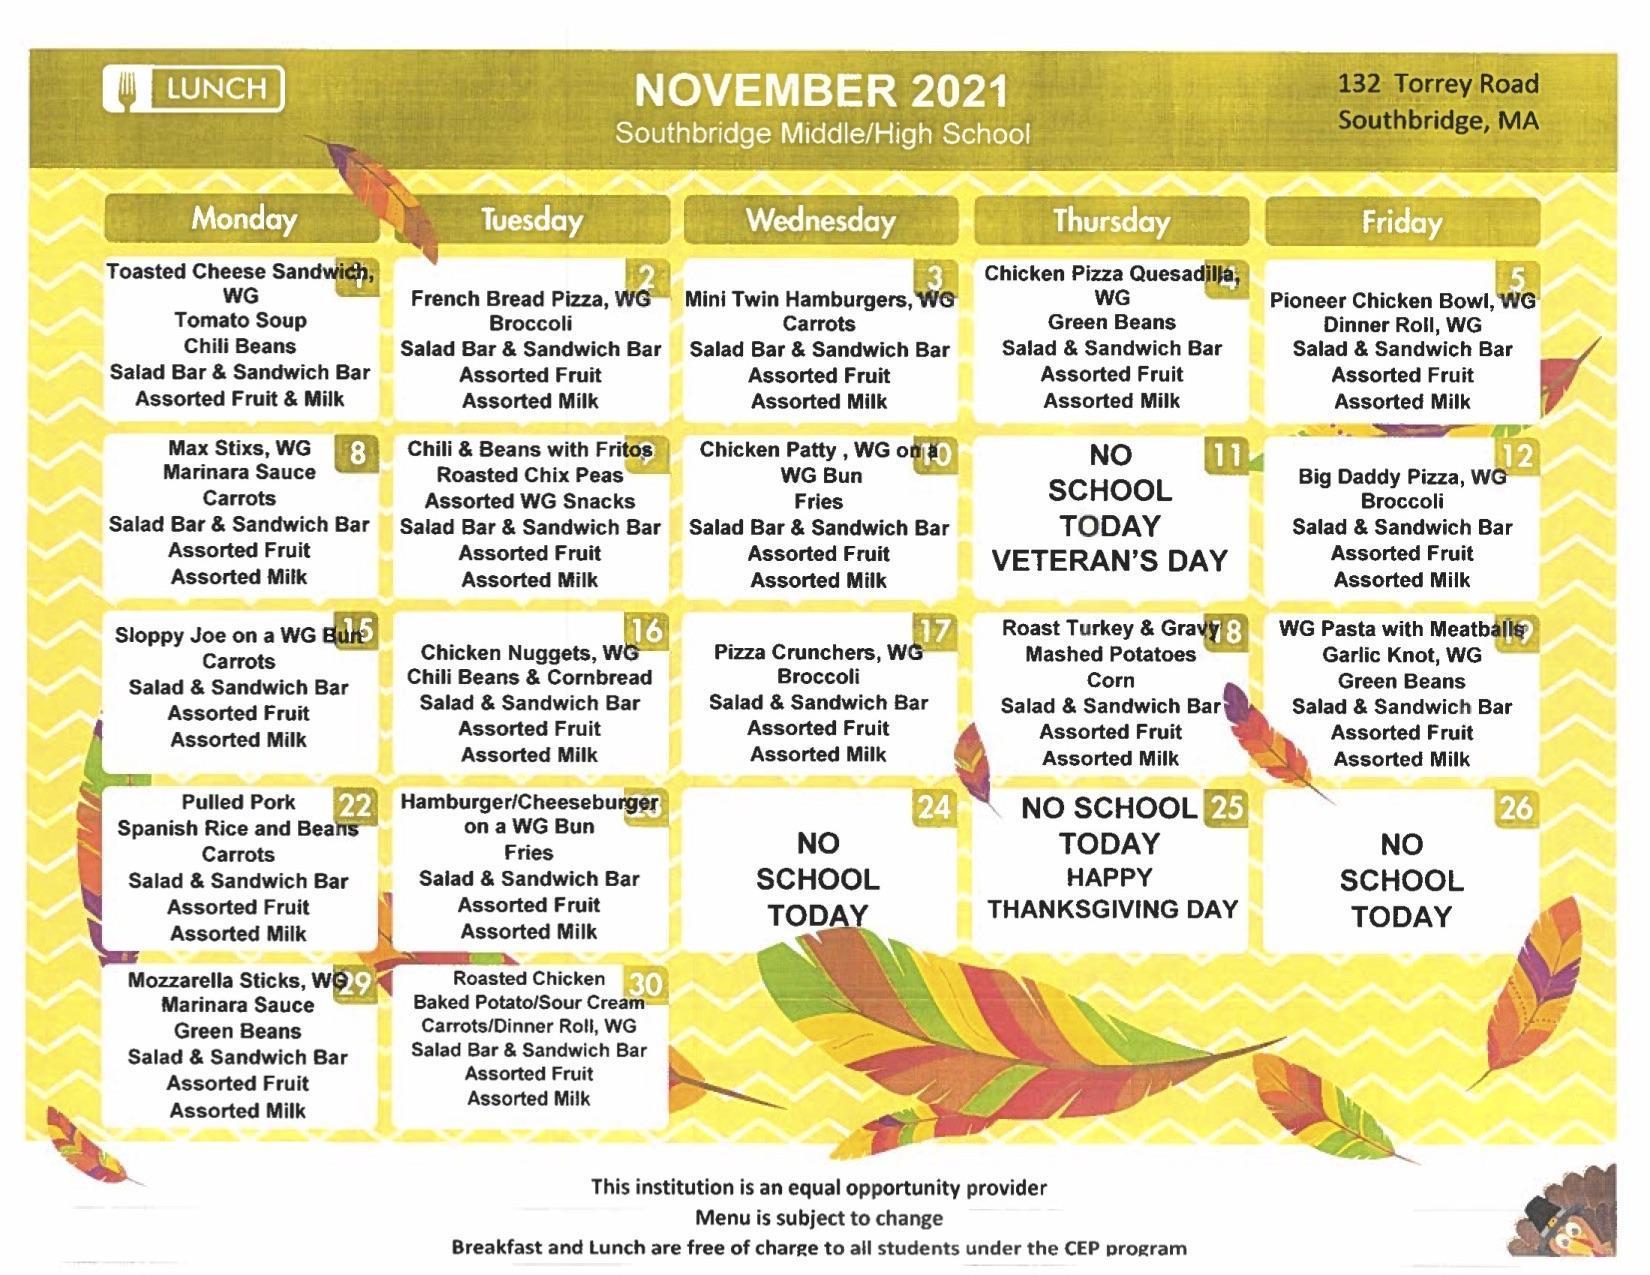 Southbridge Middle High School menu November 2021